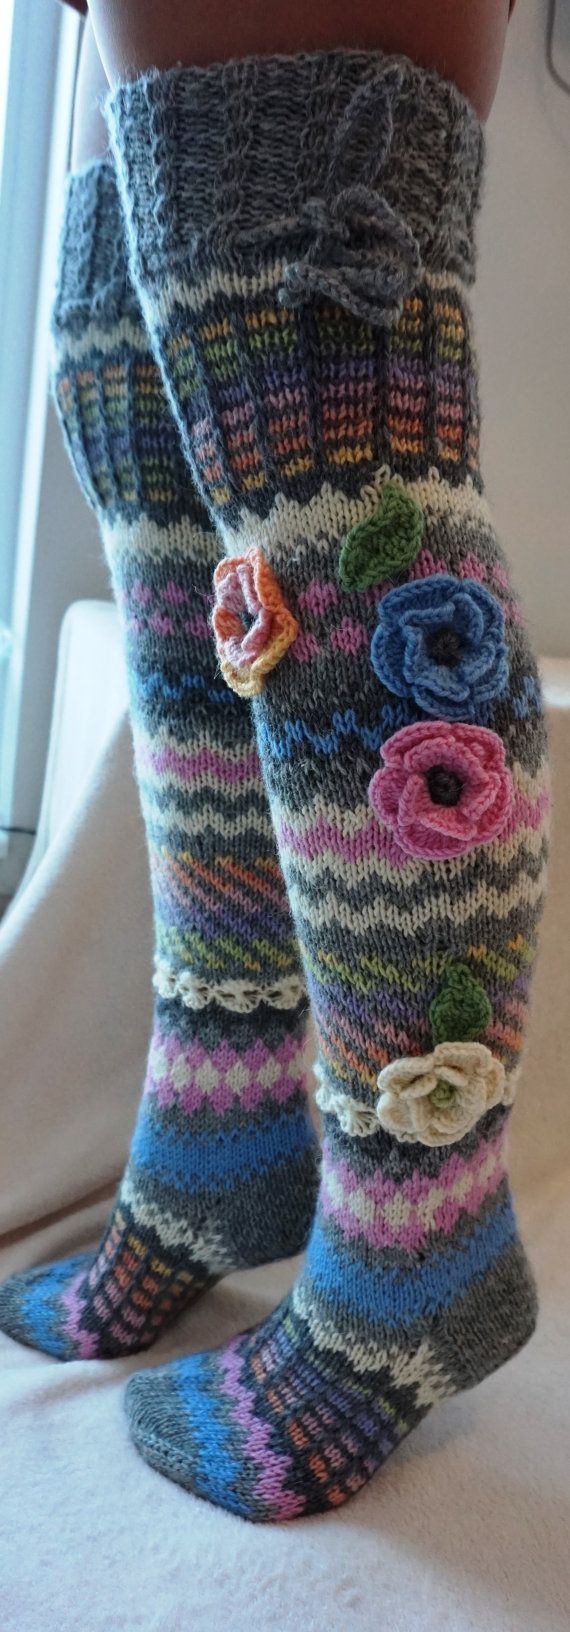 Wool socks Hand knit over knee socks  by WillowFairyJewelry